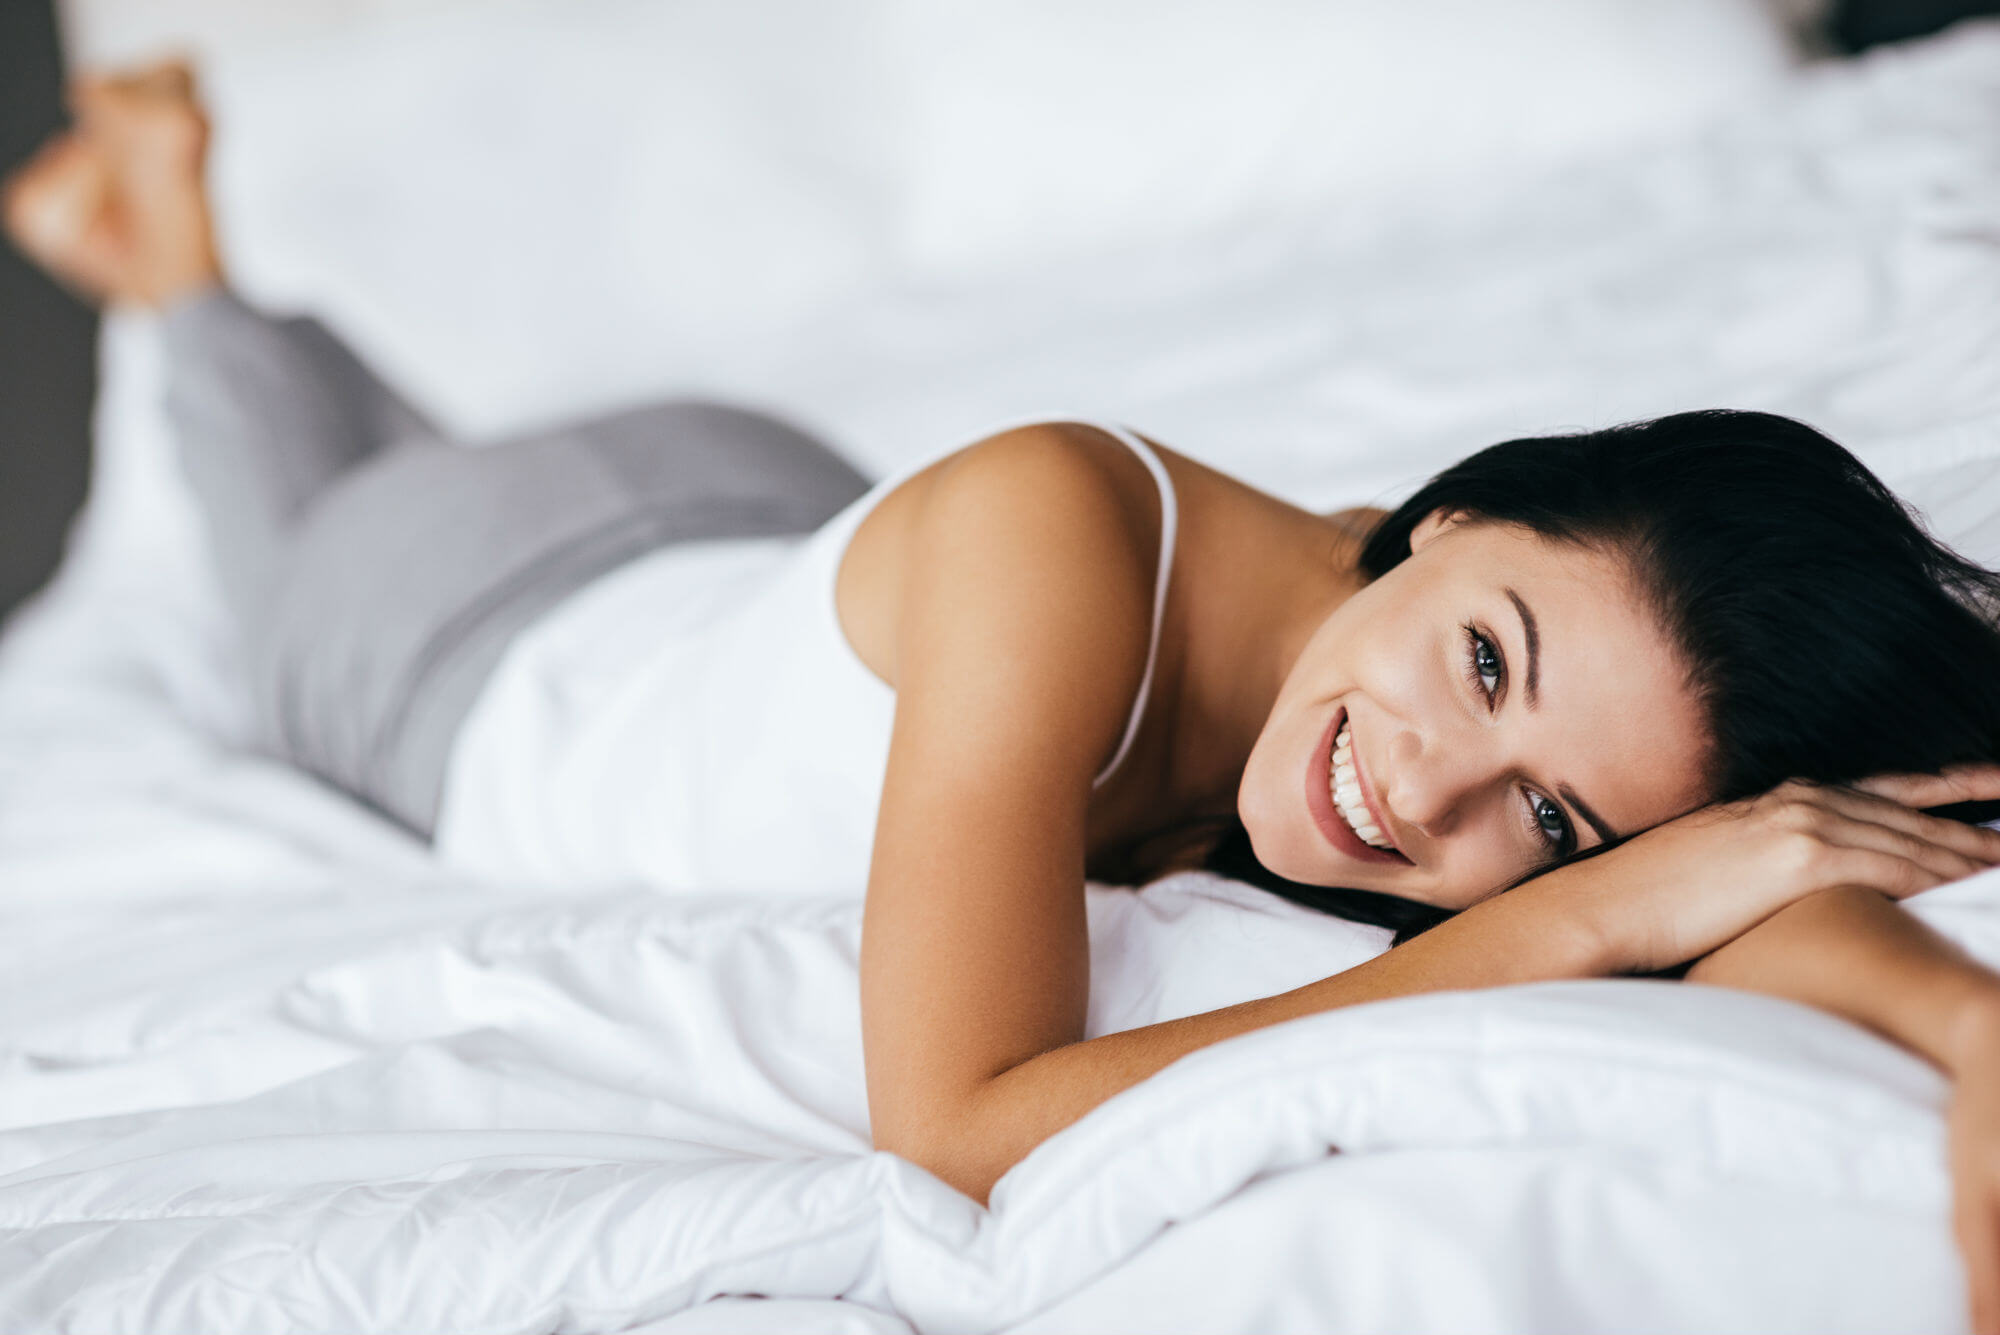 Introducing Ultra Femme 360: Your 8 Minute Vaginal Rejuvenation Treatment